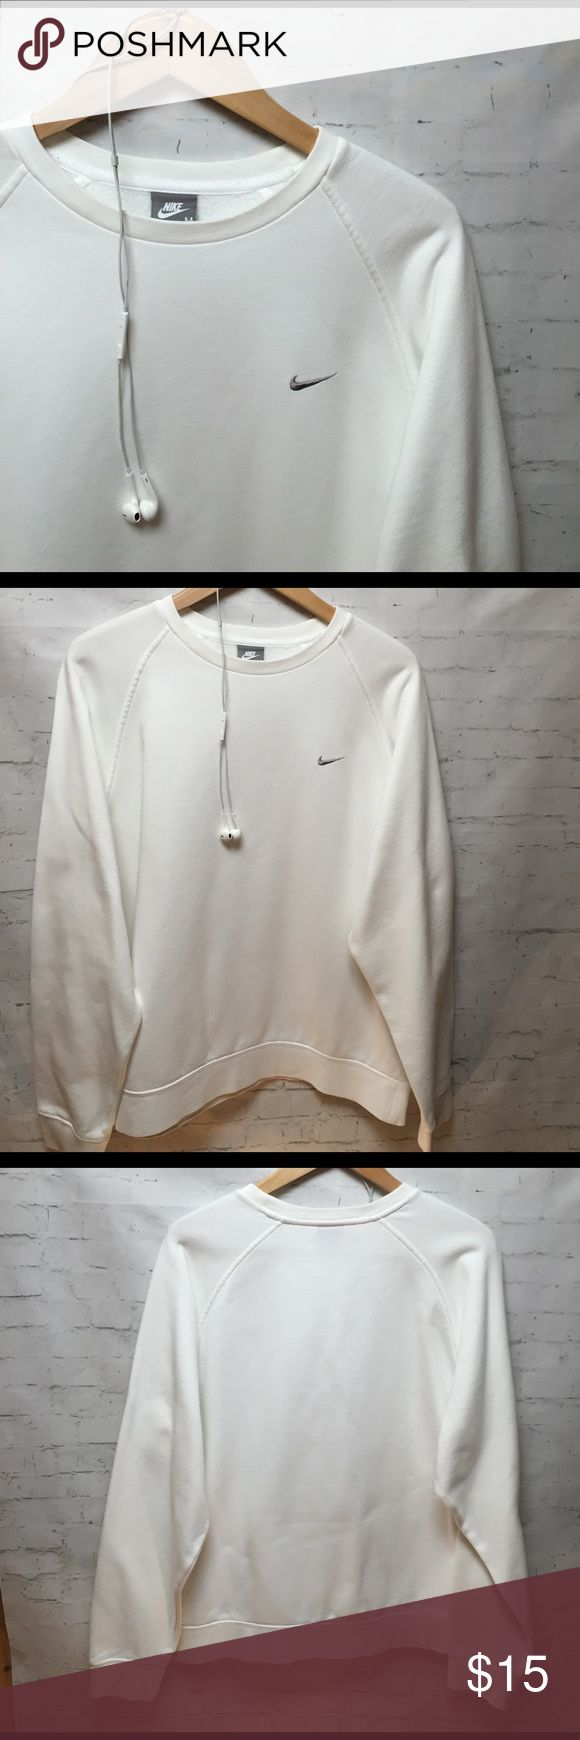 🆕 NIKE Sweatshirt NIKE Sweatshirt..White w/Gray swoosh ... Great condition! Nike Tops Sweatshirts & Hoodies